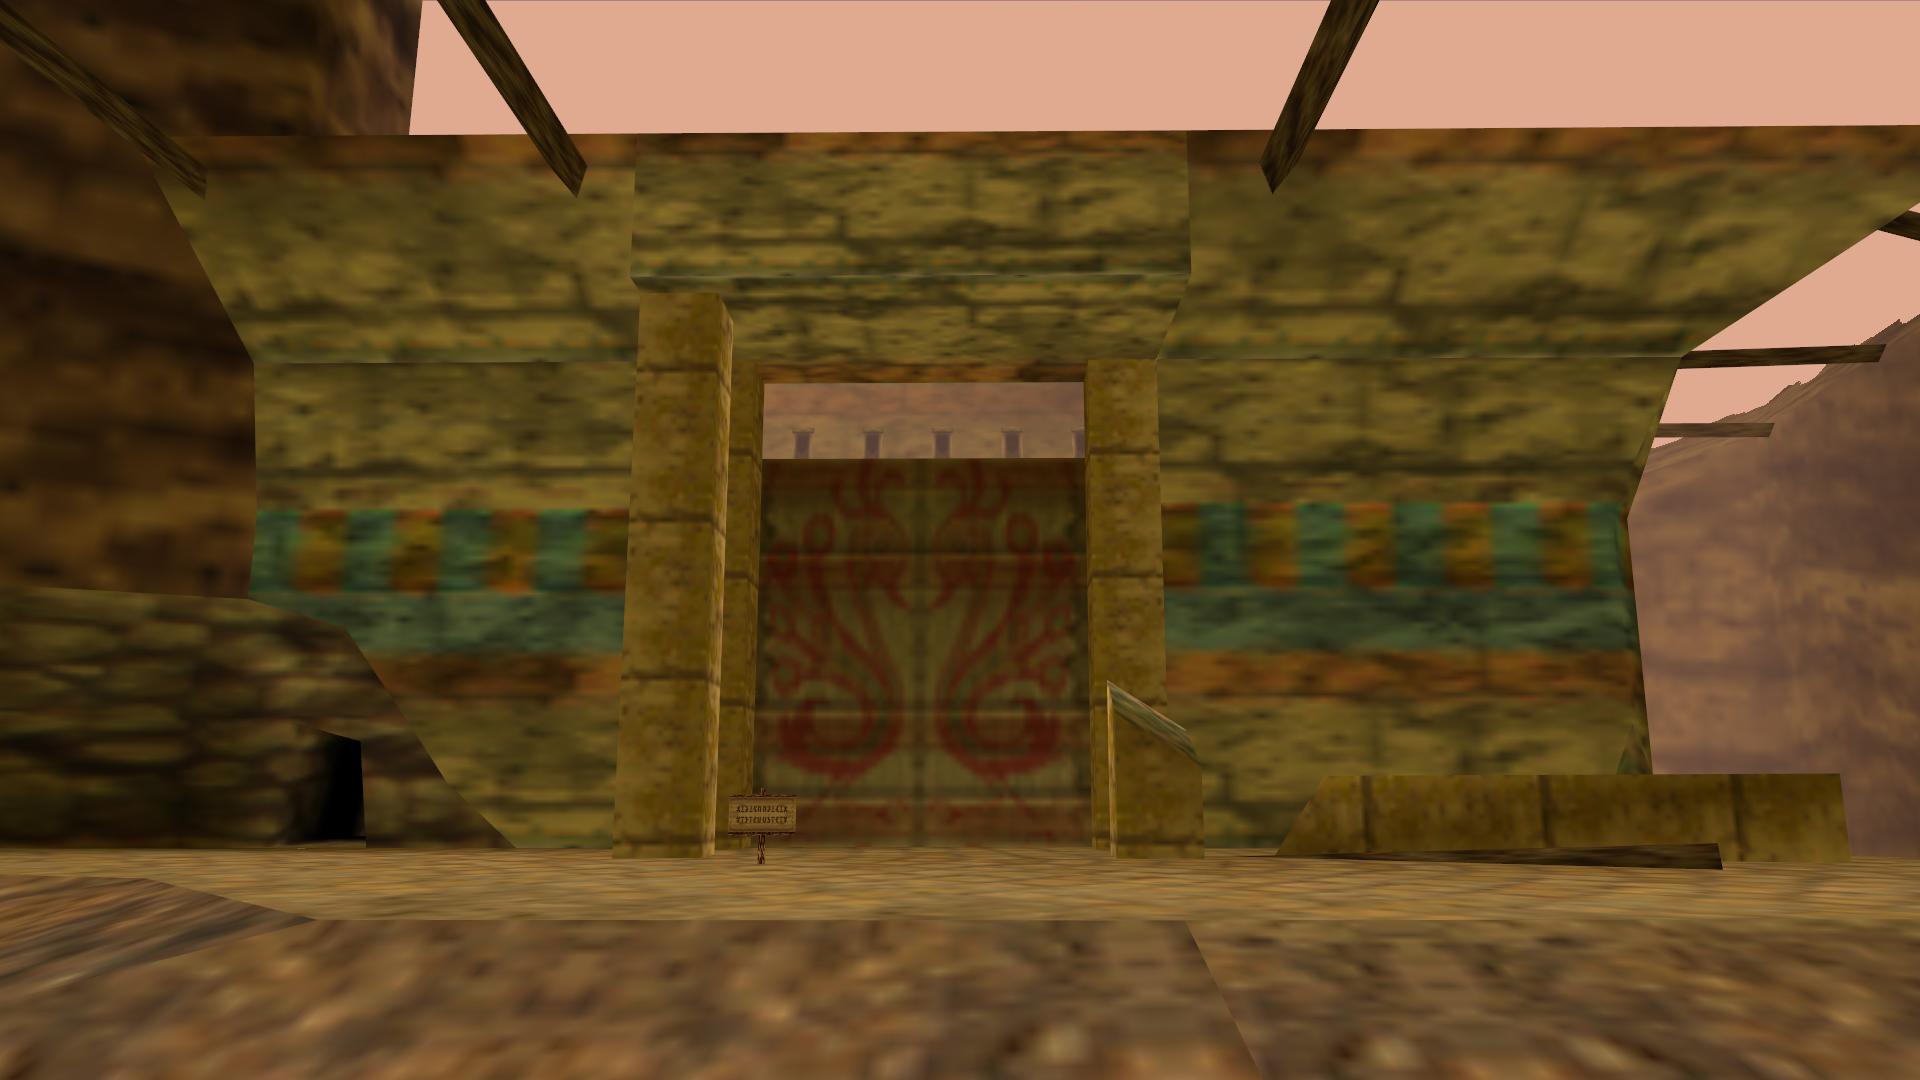 ikana castle front gate zeldapedia fandom powered by wikia